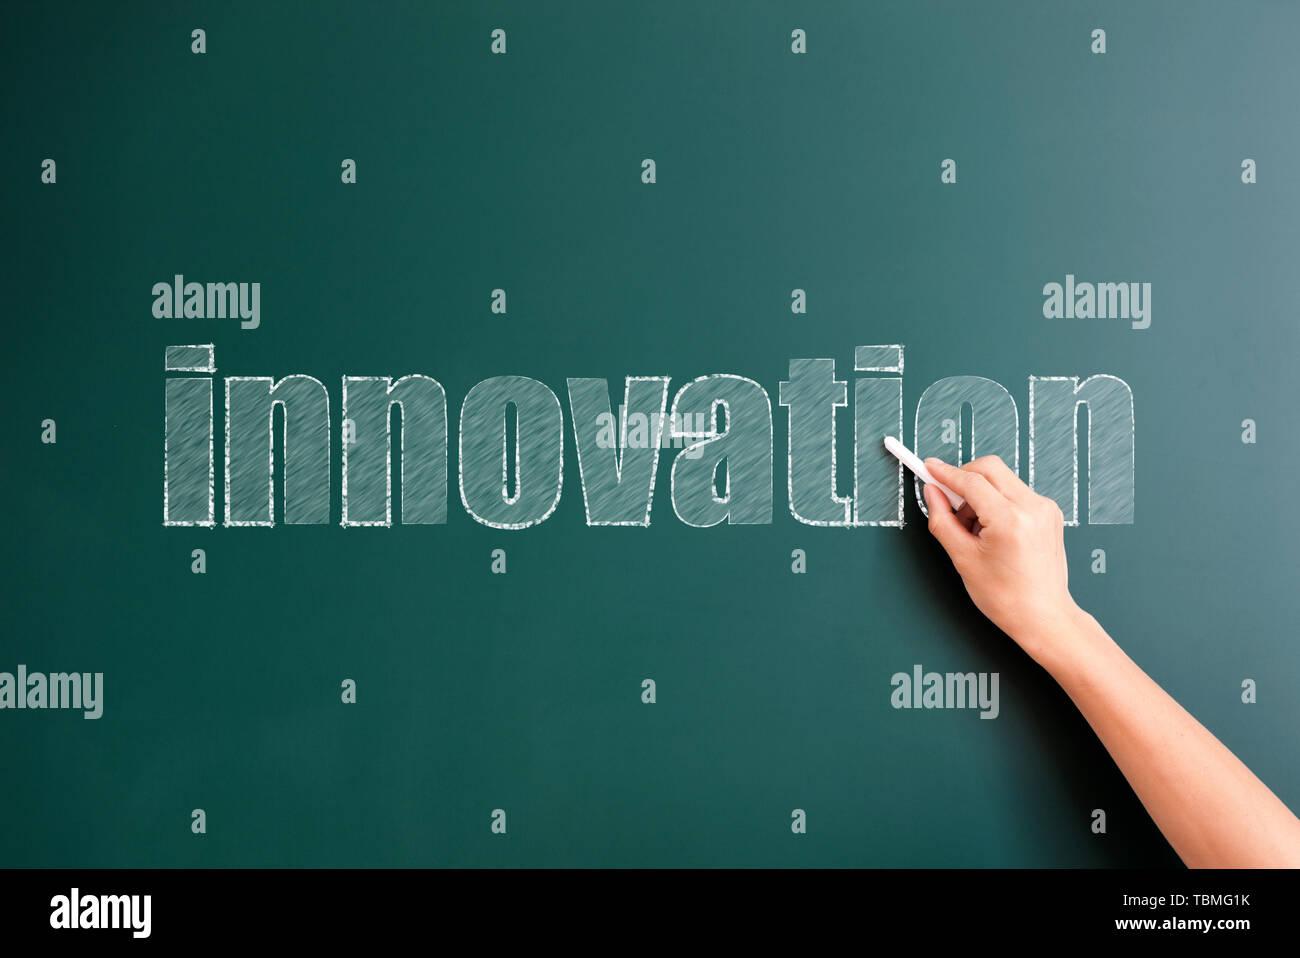 Innovation written on background - Stock Image